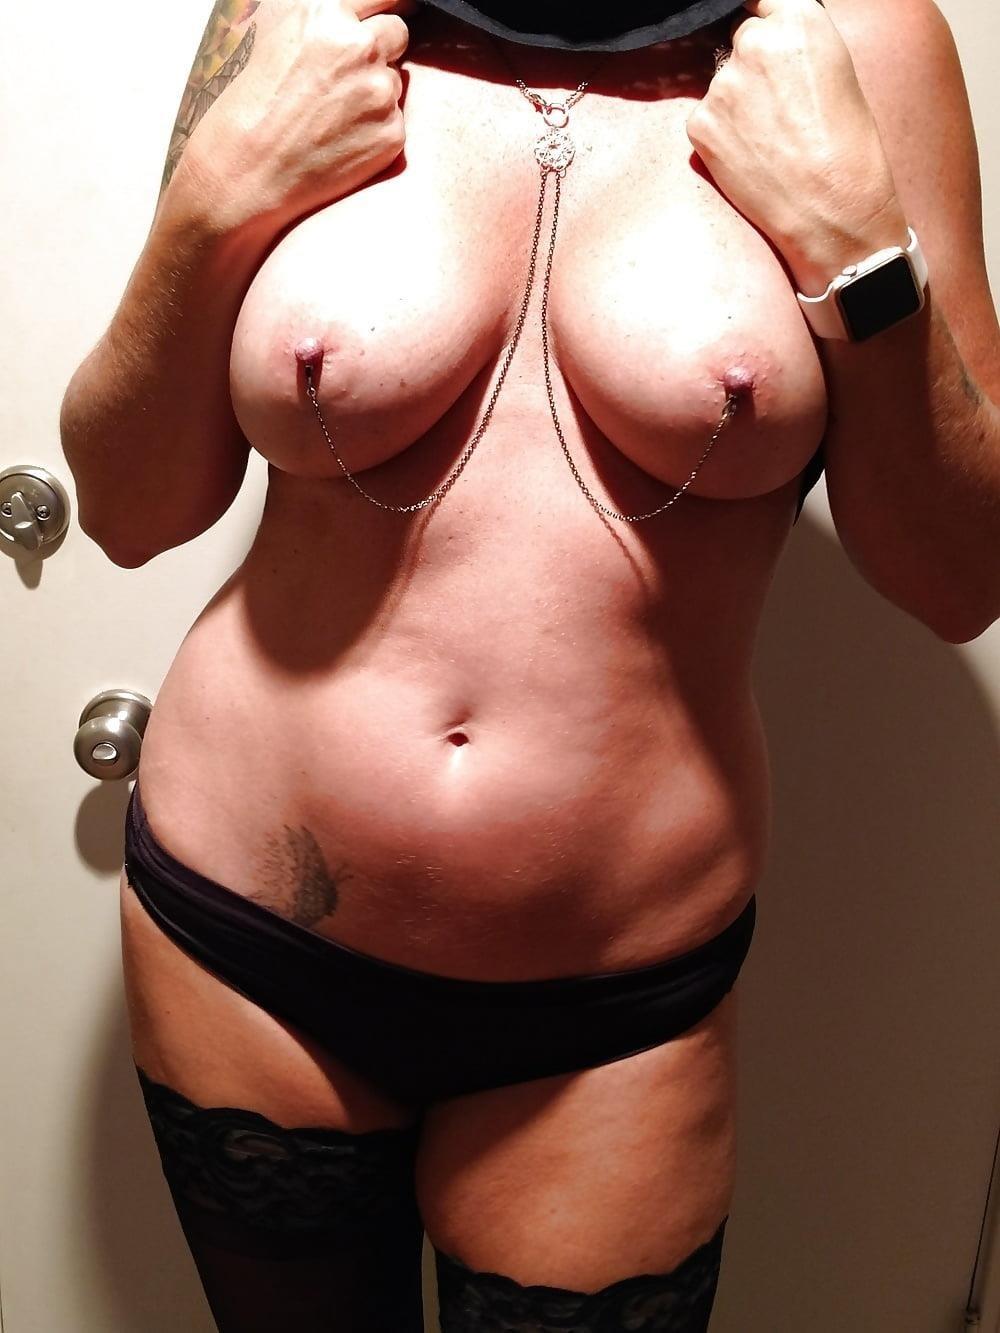 Milfs in lingerie pics-2145